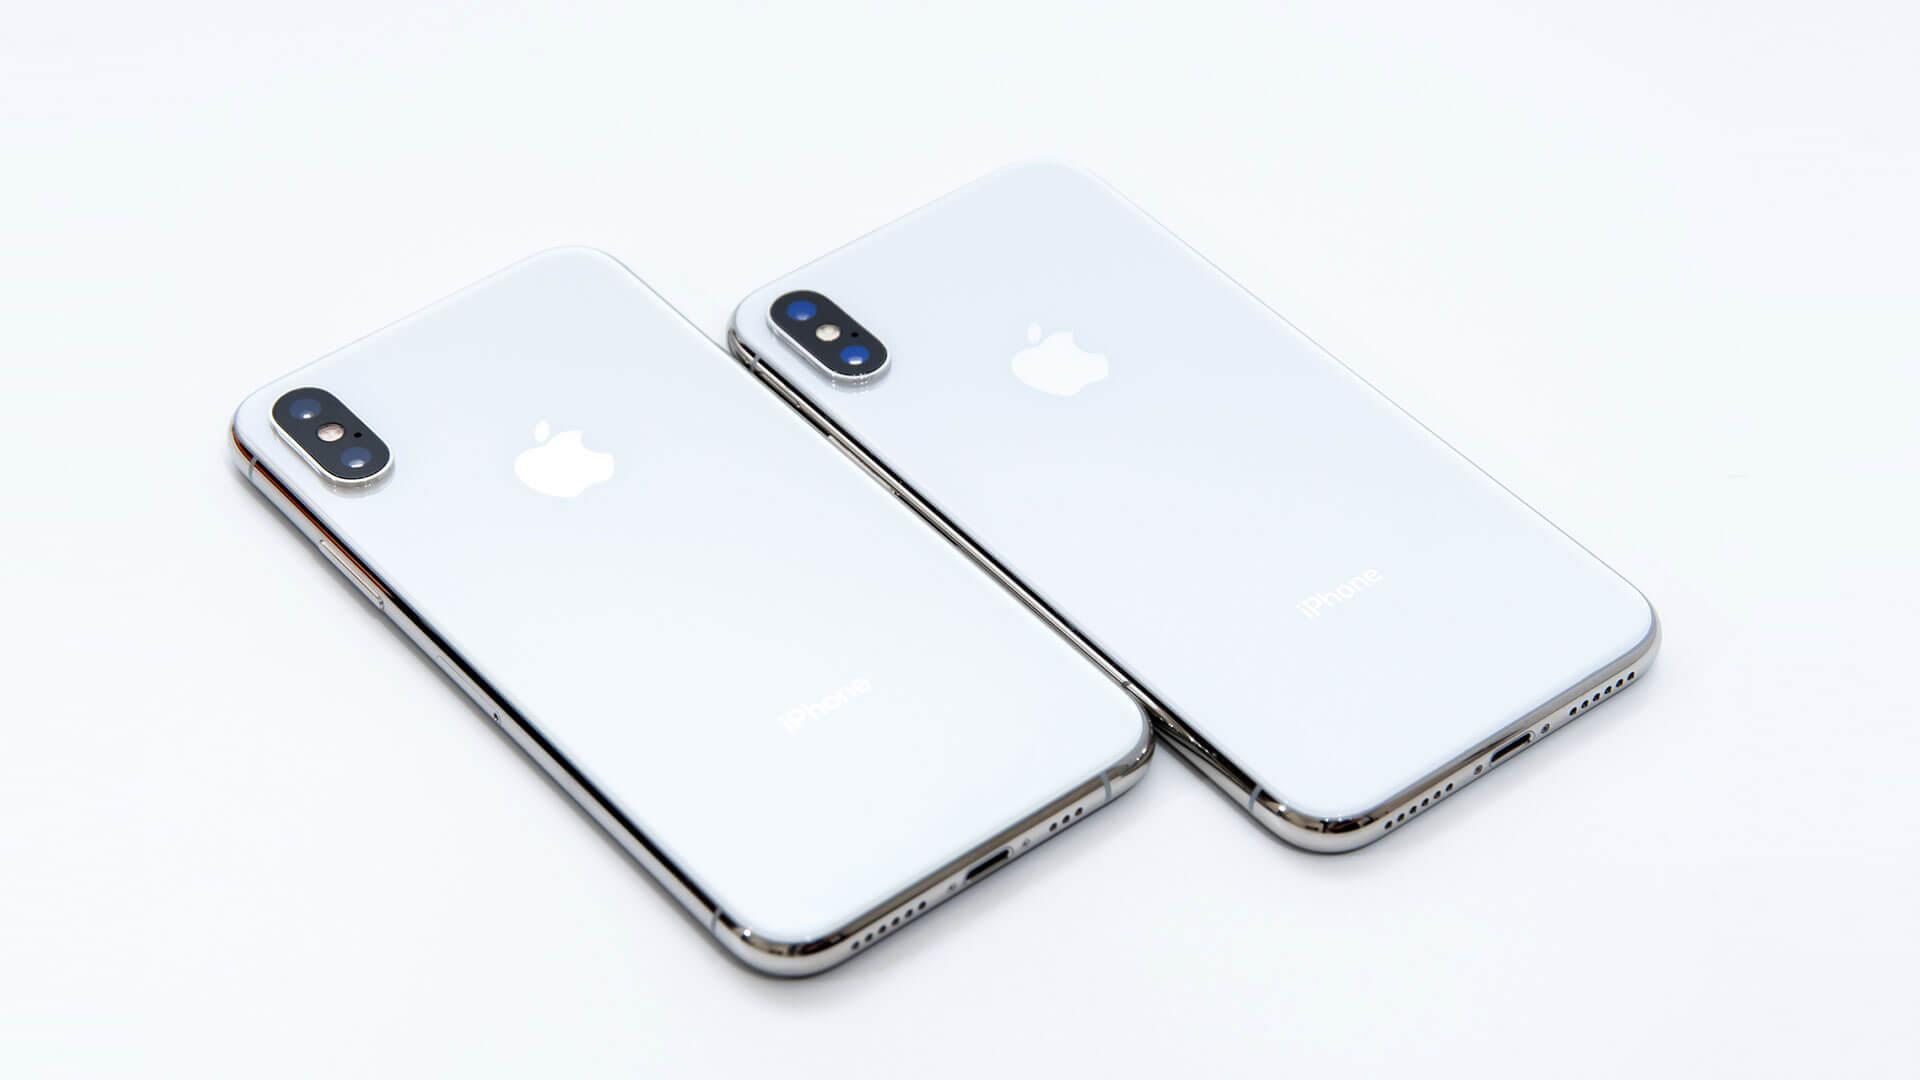 iPhone XSとiPhone Xの外観・スペック・カメラ性能を比較してみた